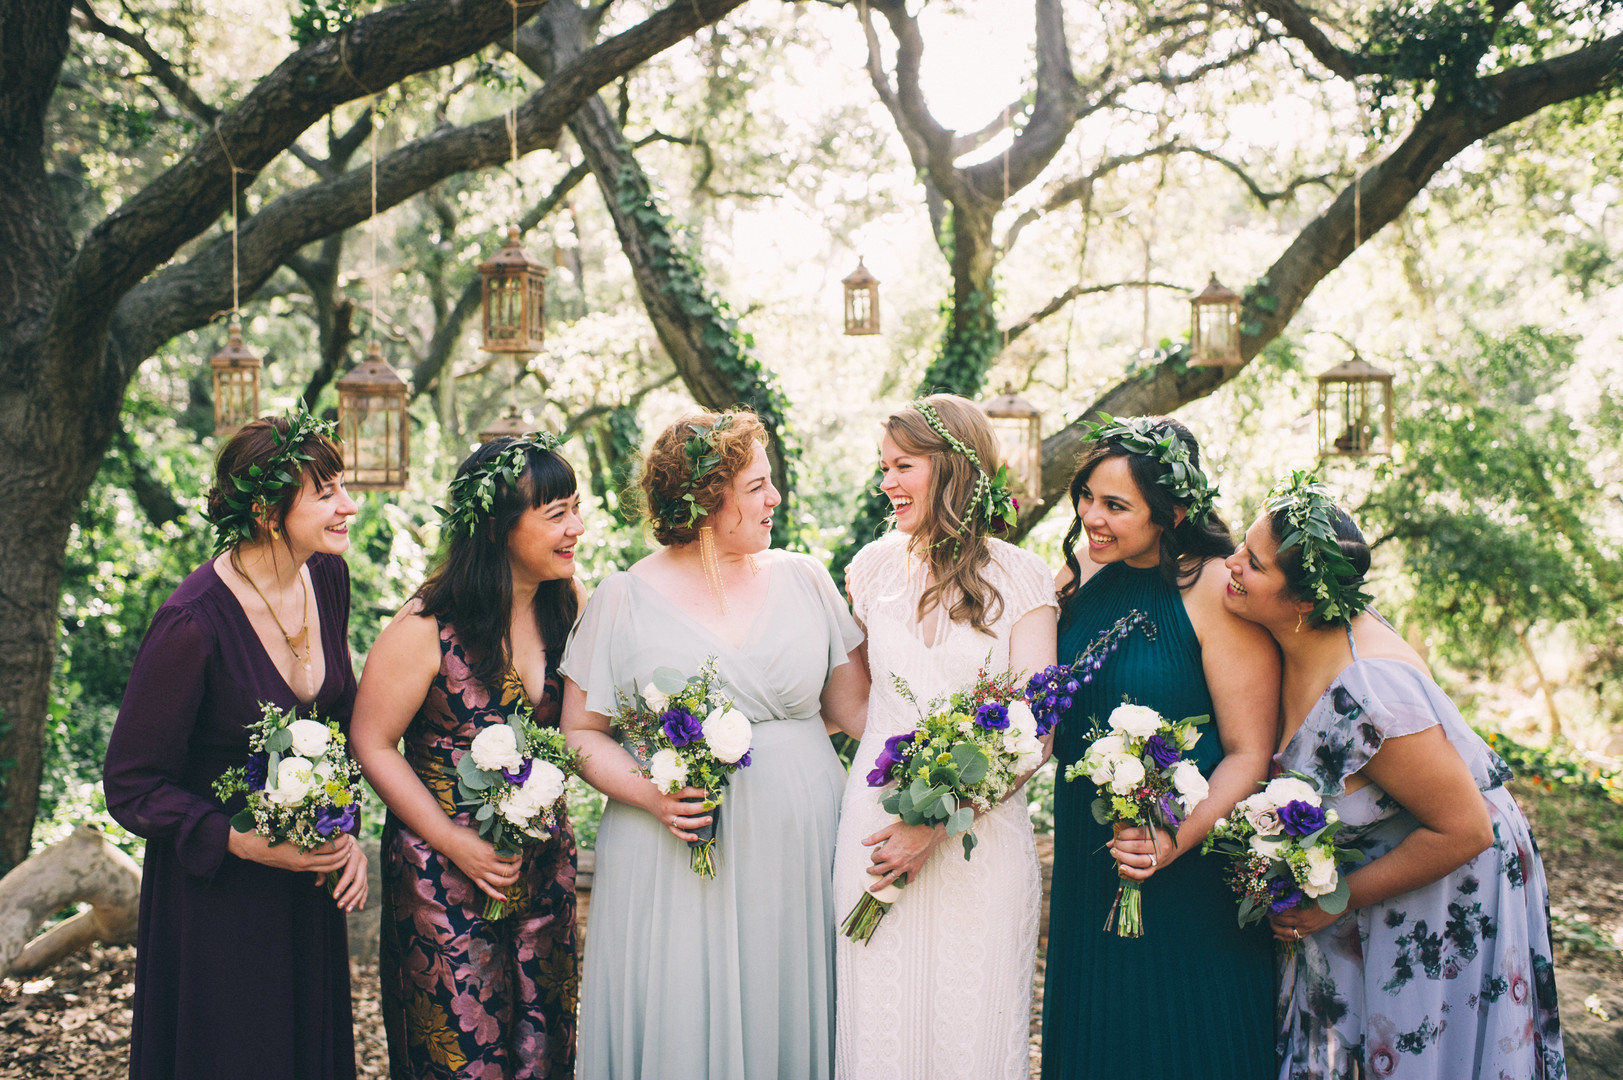 www.santabarbarawedding.com | Sarah Katherine Davis Photography | Santa Barbara Museum of Natural History | Wild Heart Events | Ella and Louie | Bride with Bridesmaids